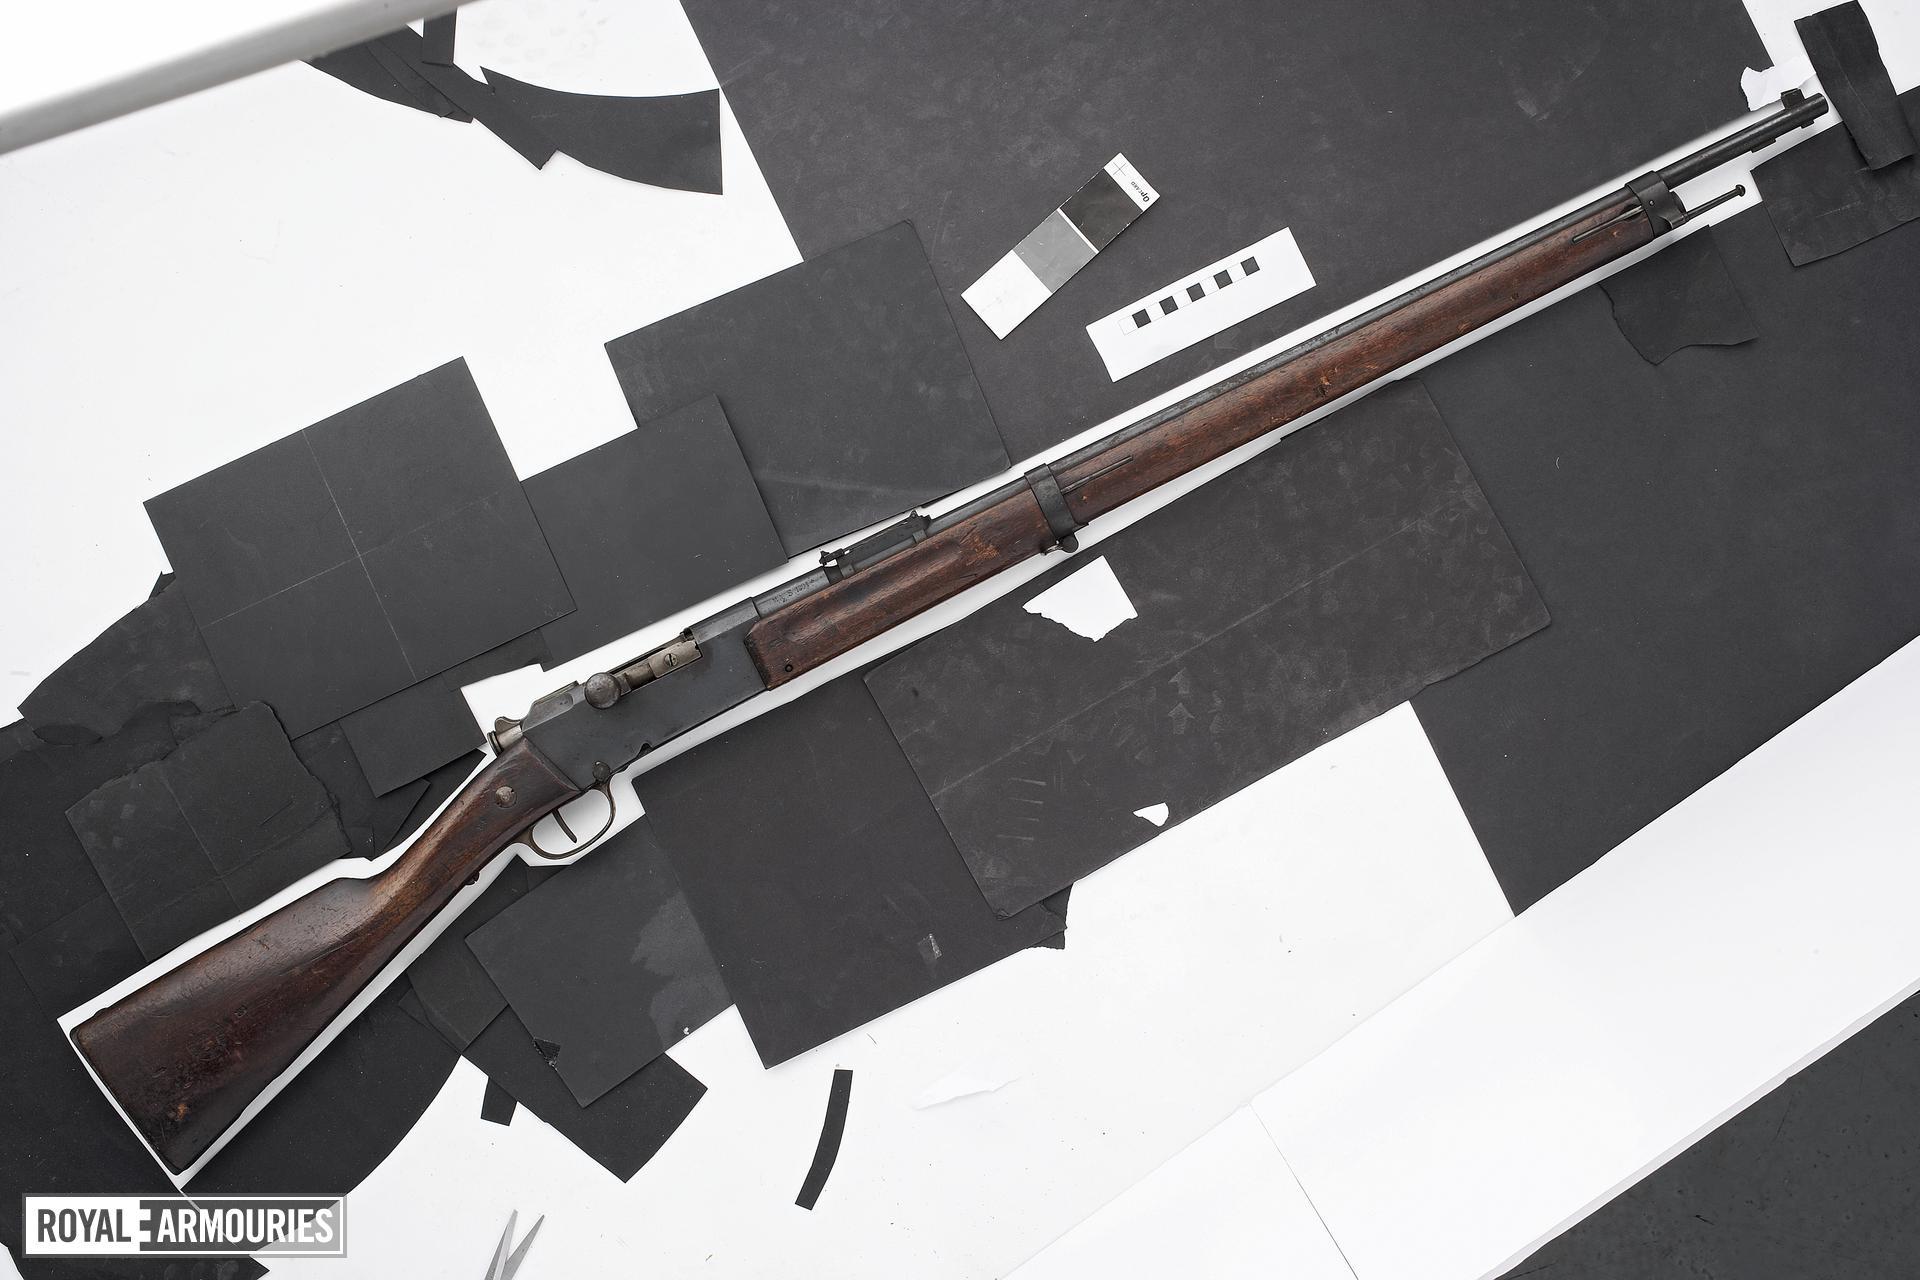 Centrefire bolt-action magazine rifle - Gras Kropatschek Lebel rifle